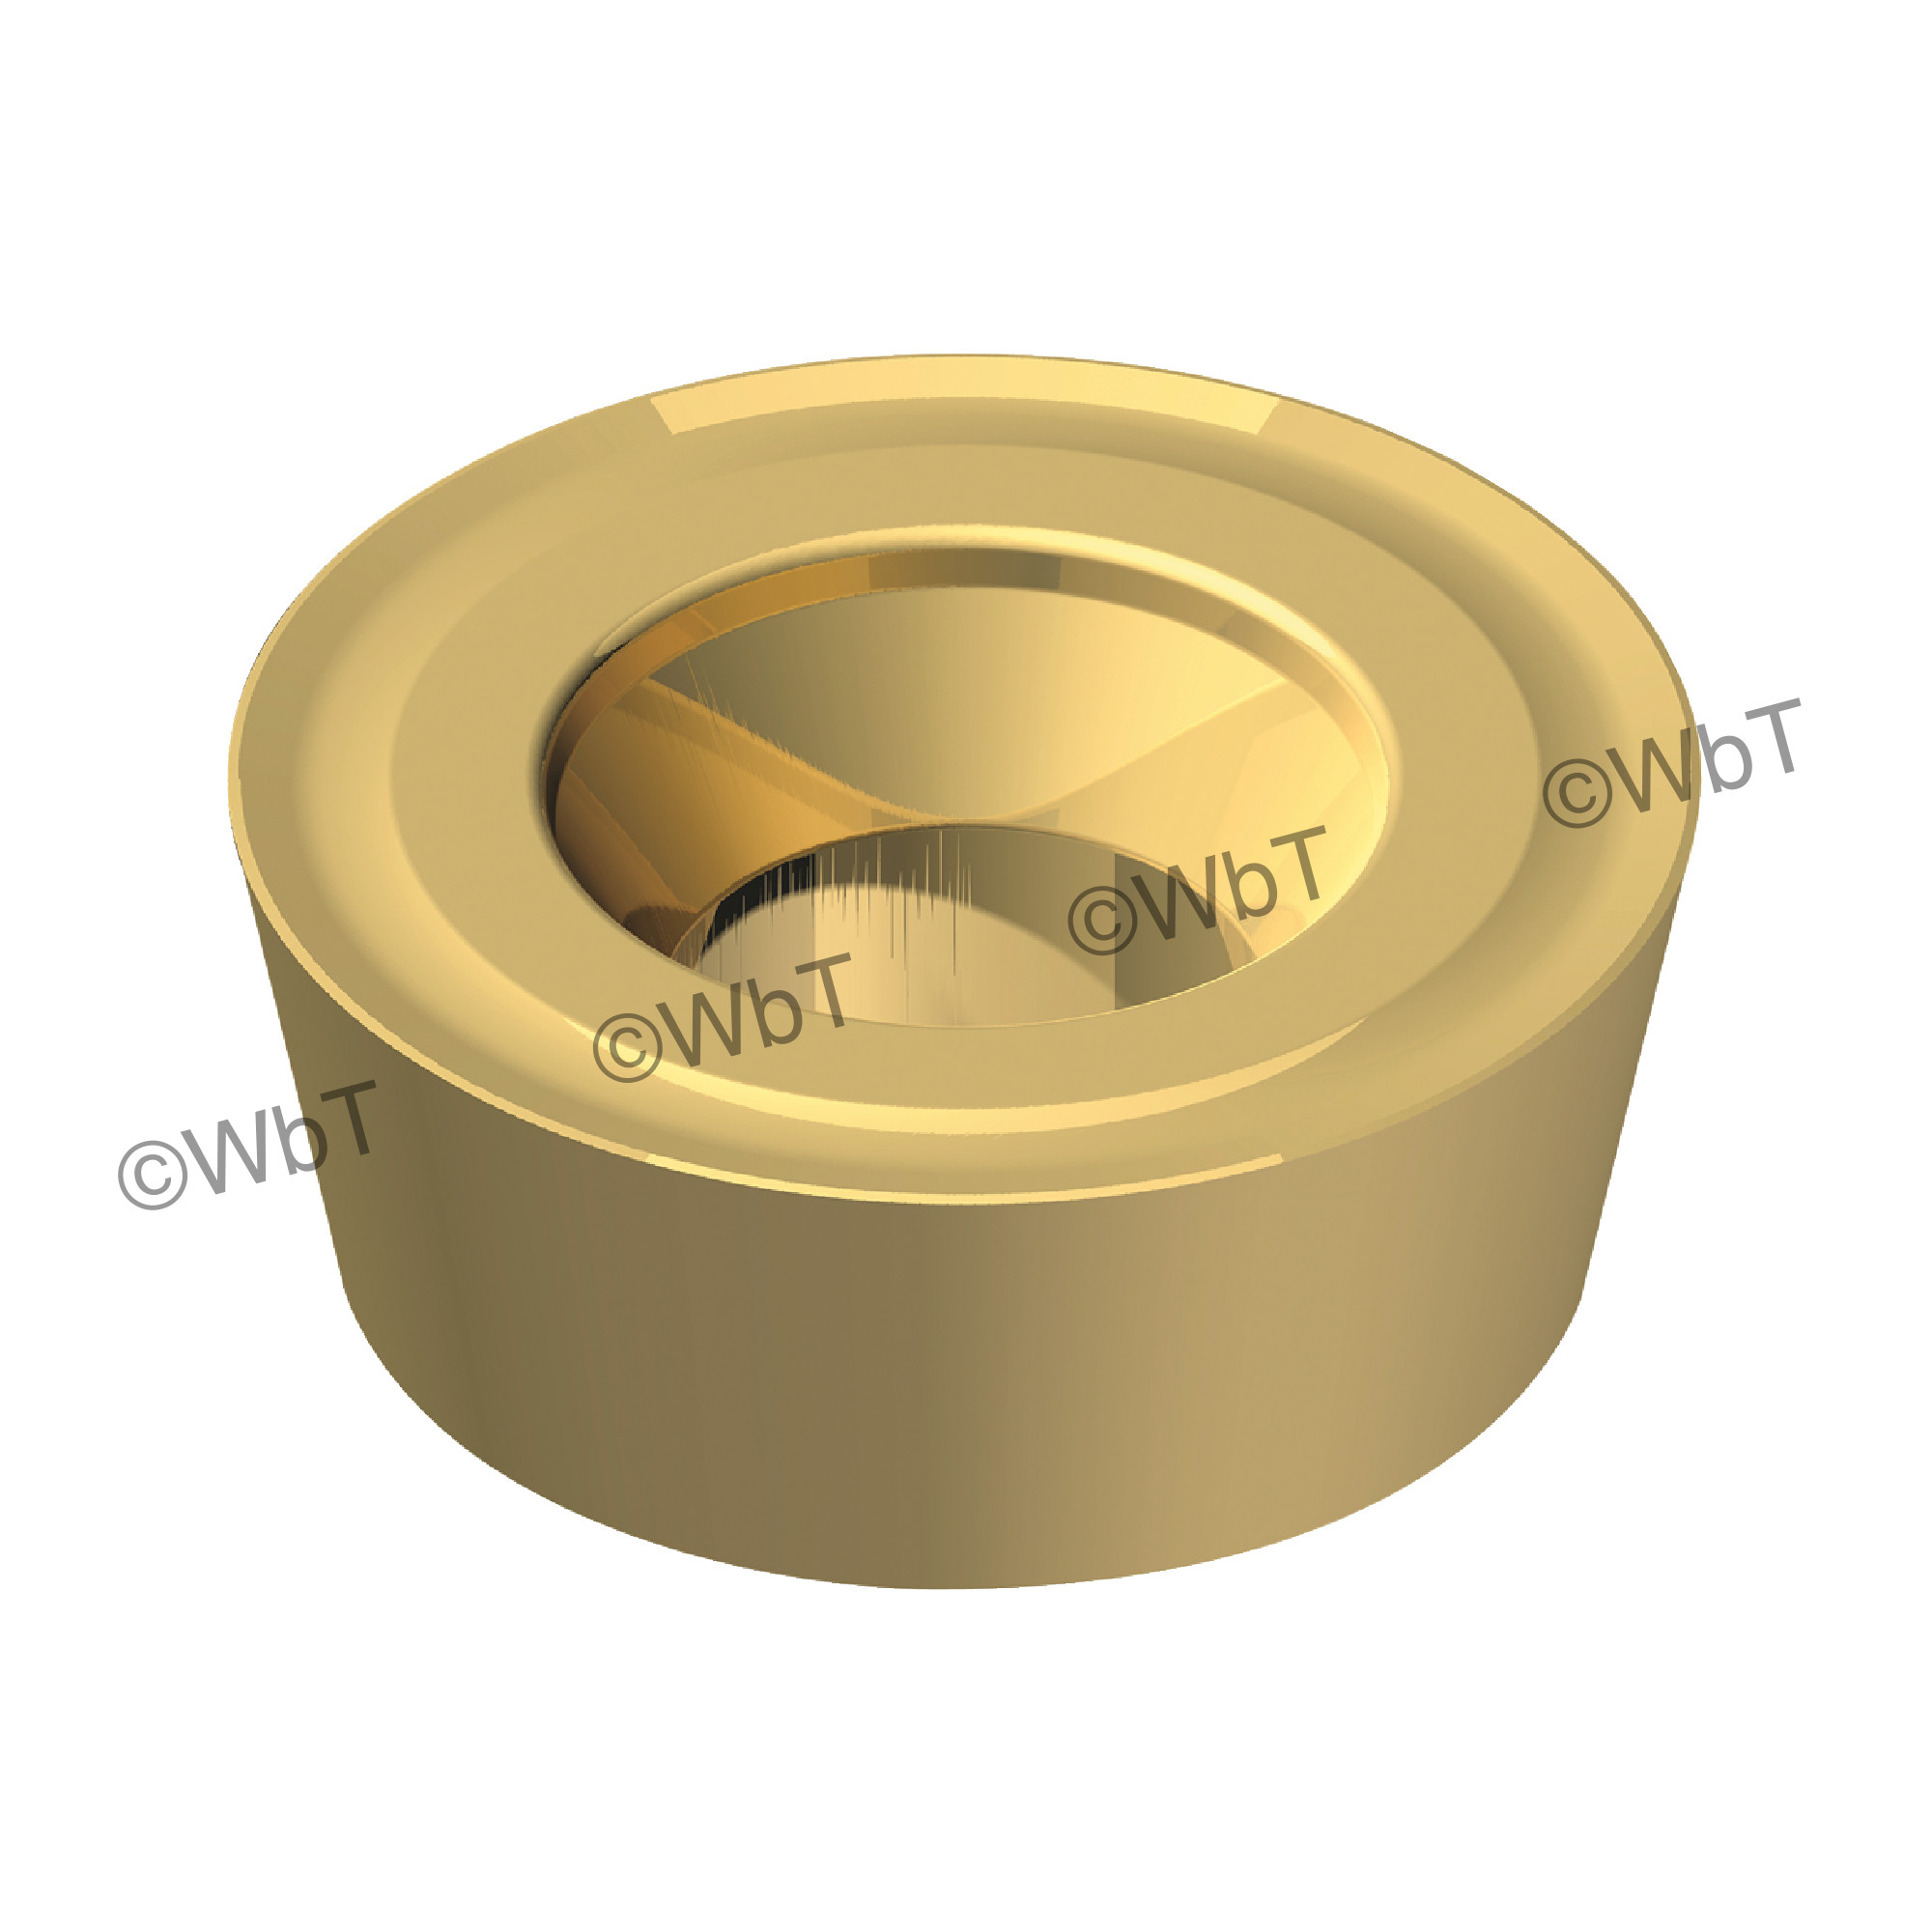 AKUMA - RPMT1204M0S-M1 CM30P Round / Indexable Carbide Milling Insert